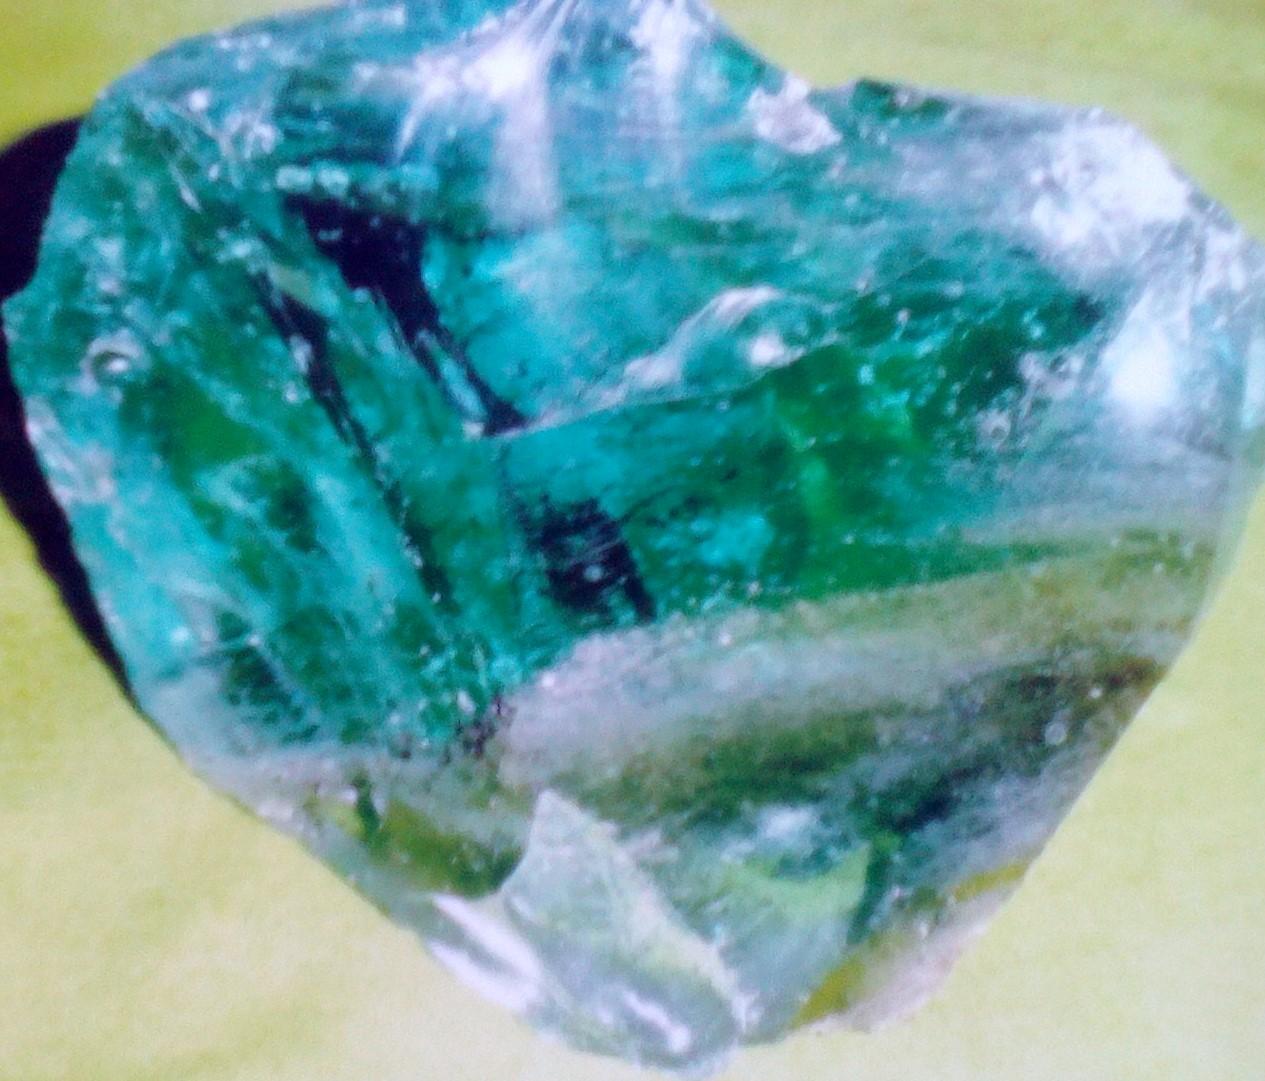 Volcanic glass varieties two specimens